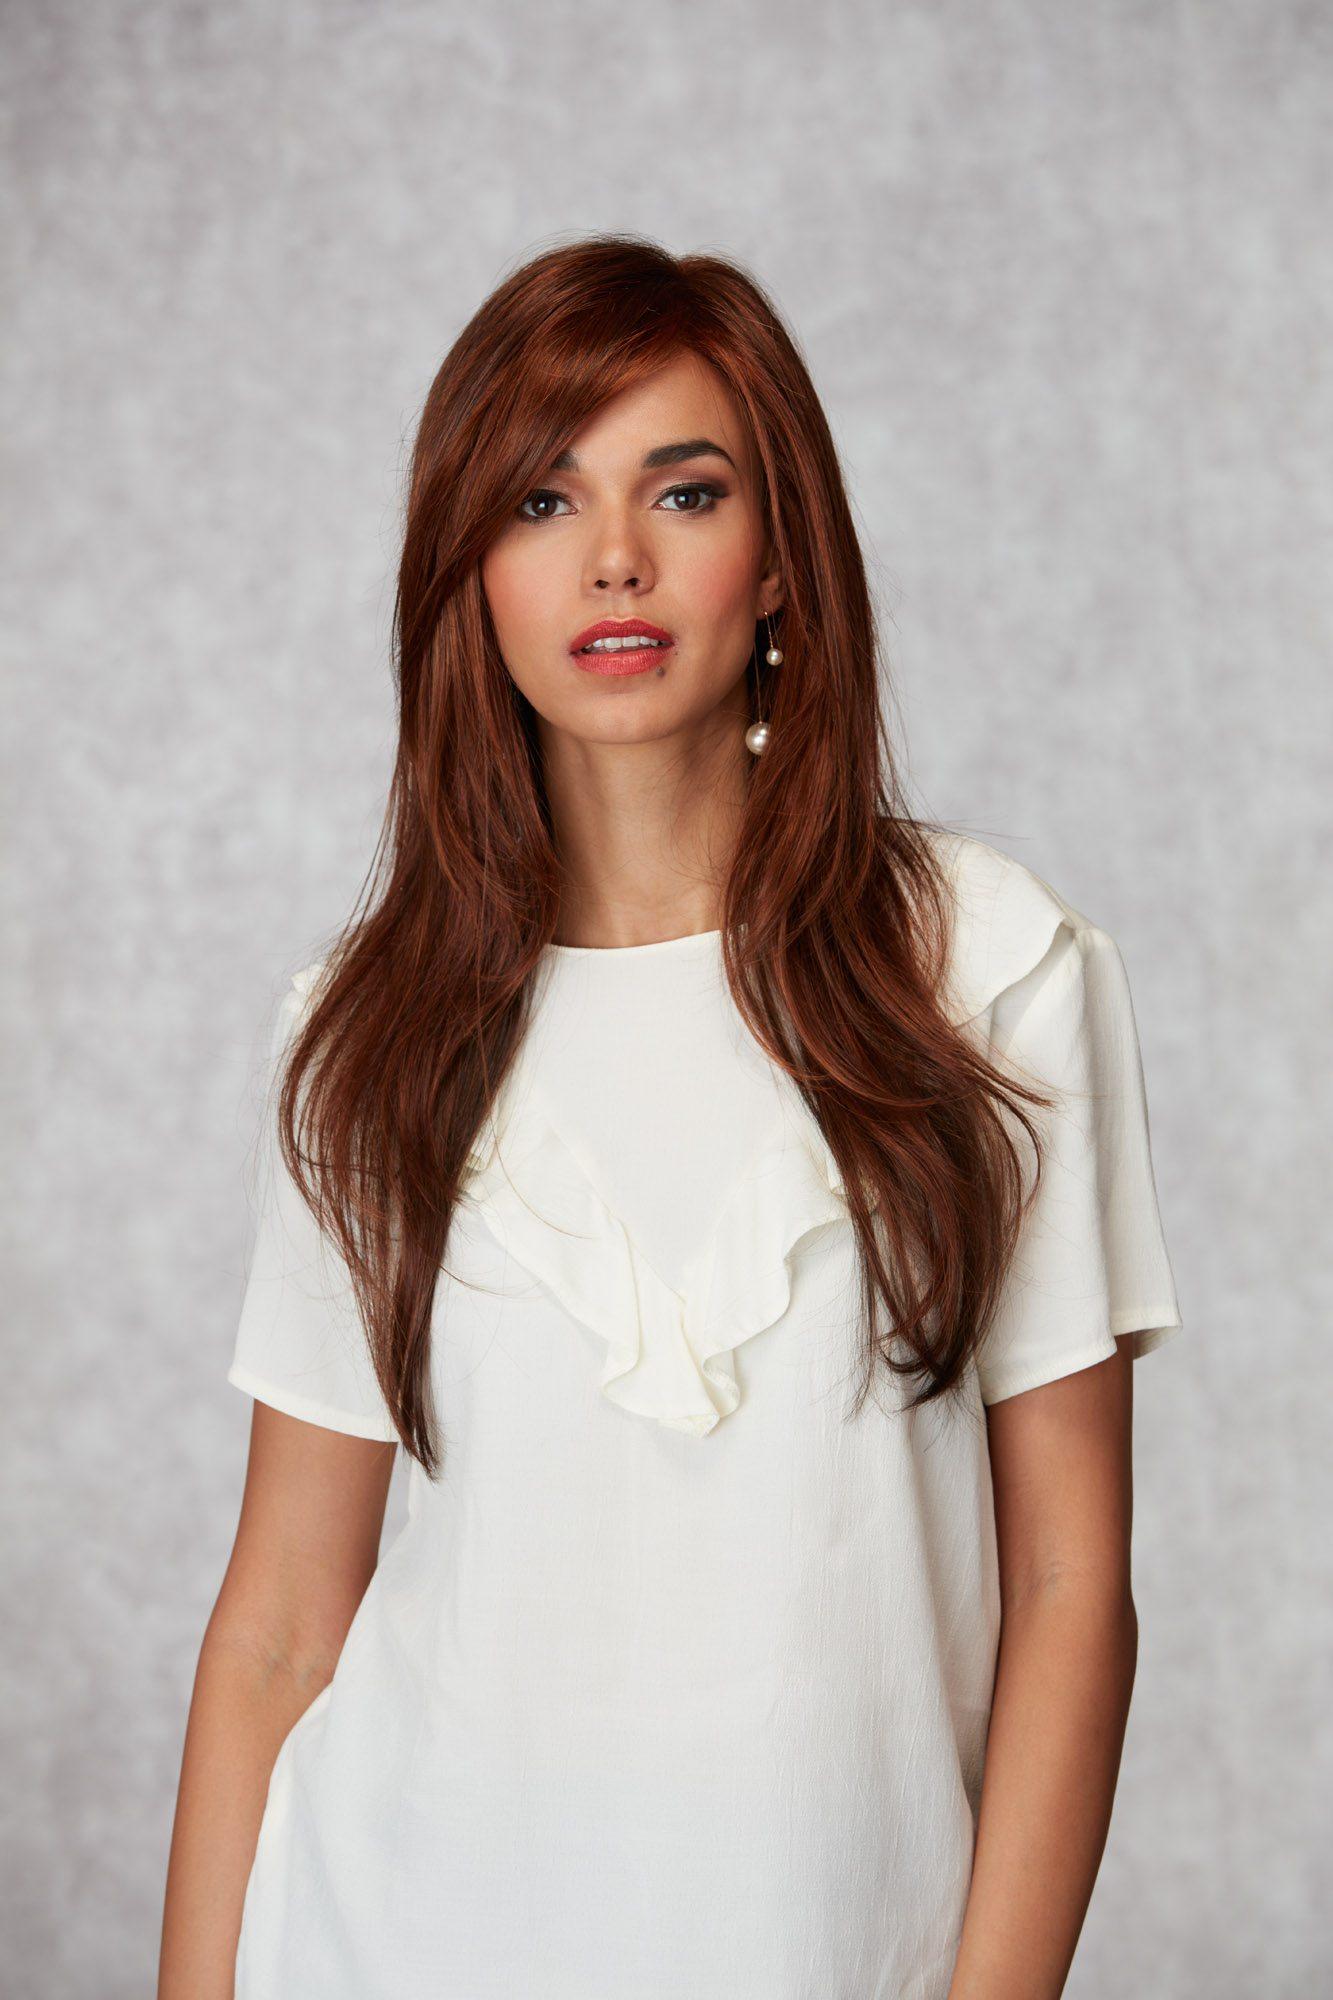 Anya Wig Hair World - image Chance_G30_1307 on https://purewigs.com